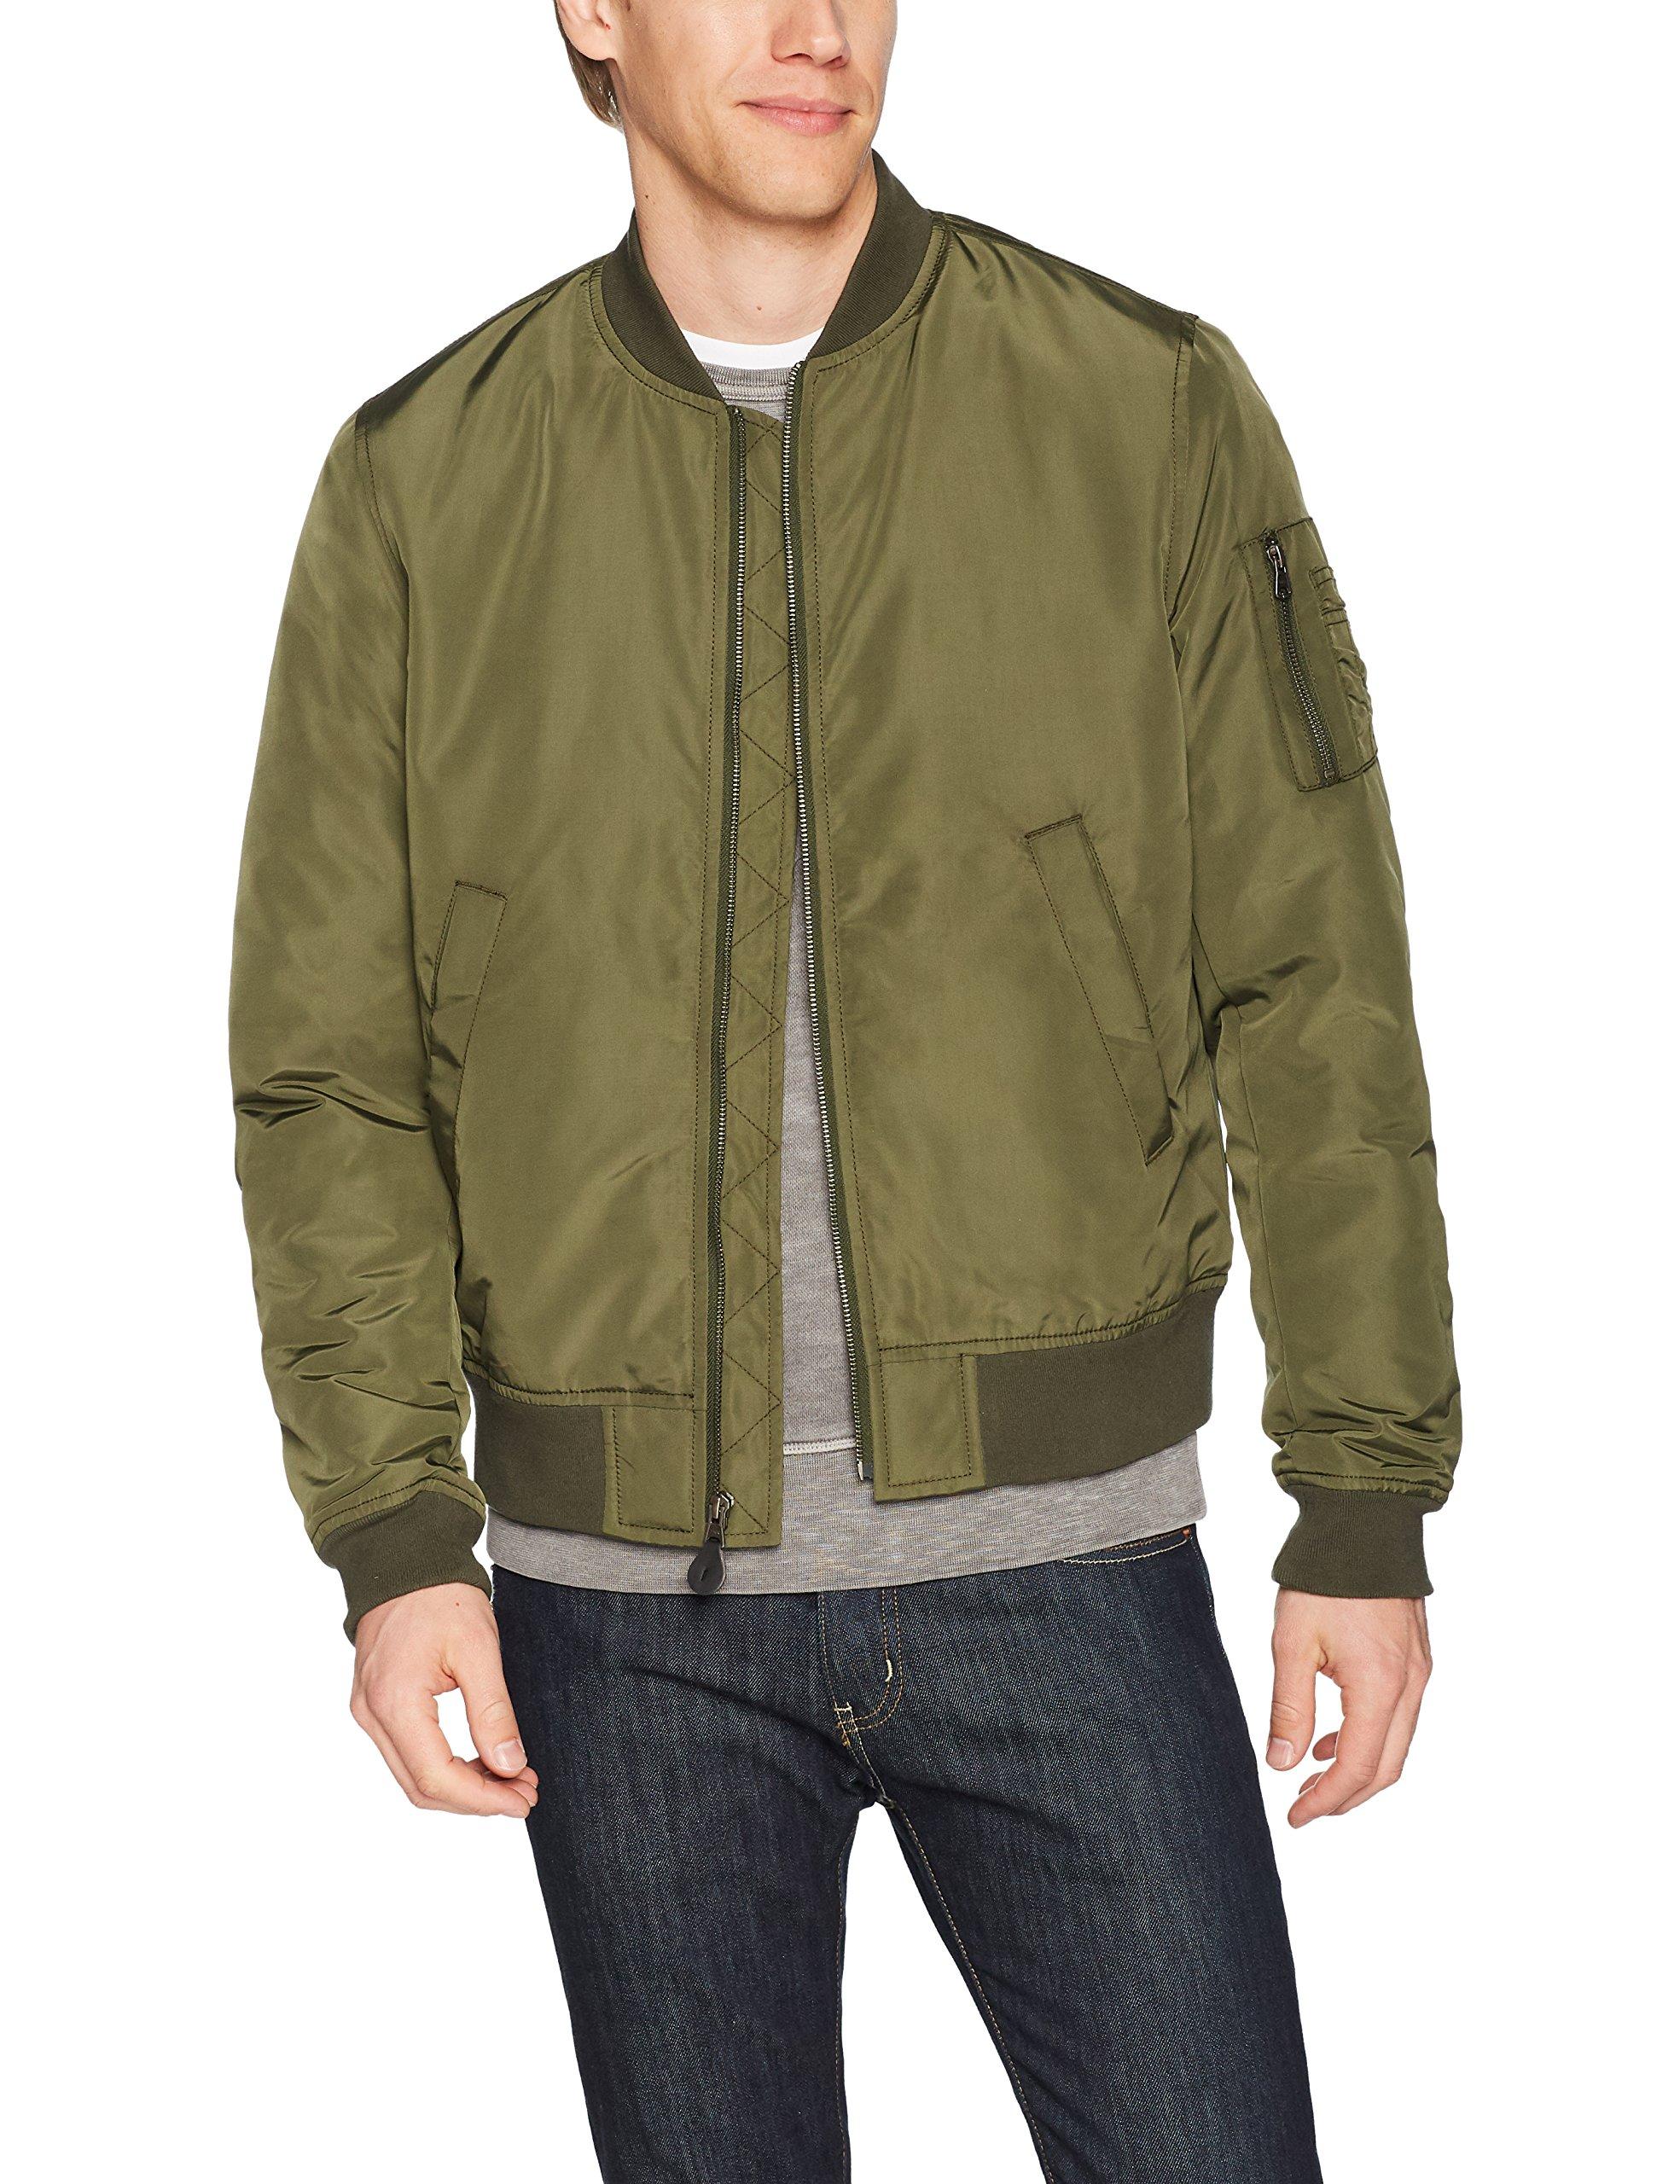 Goodthreads Men's Bomber Jacket, Olive, Small